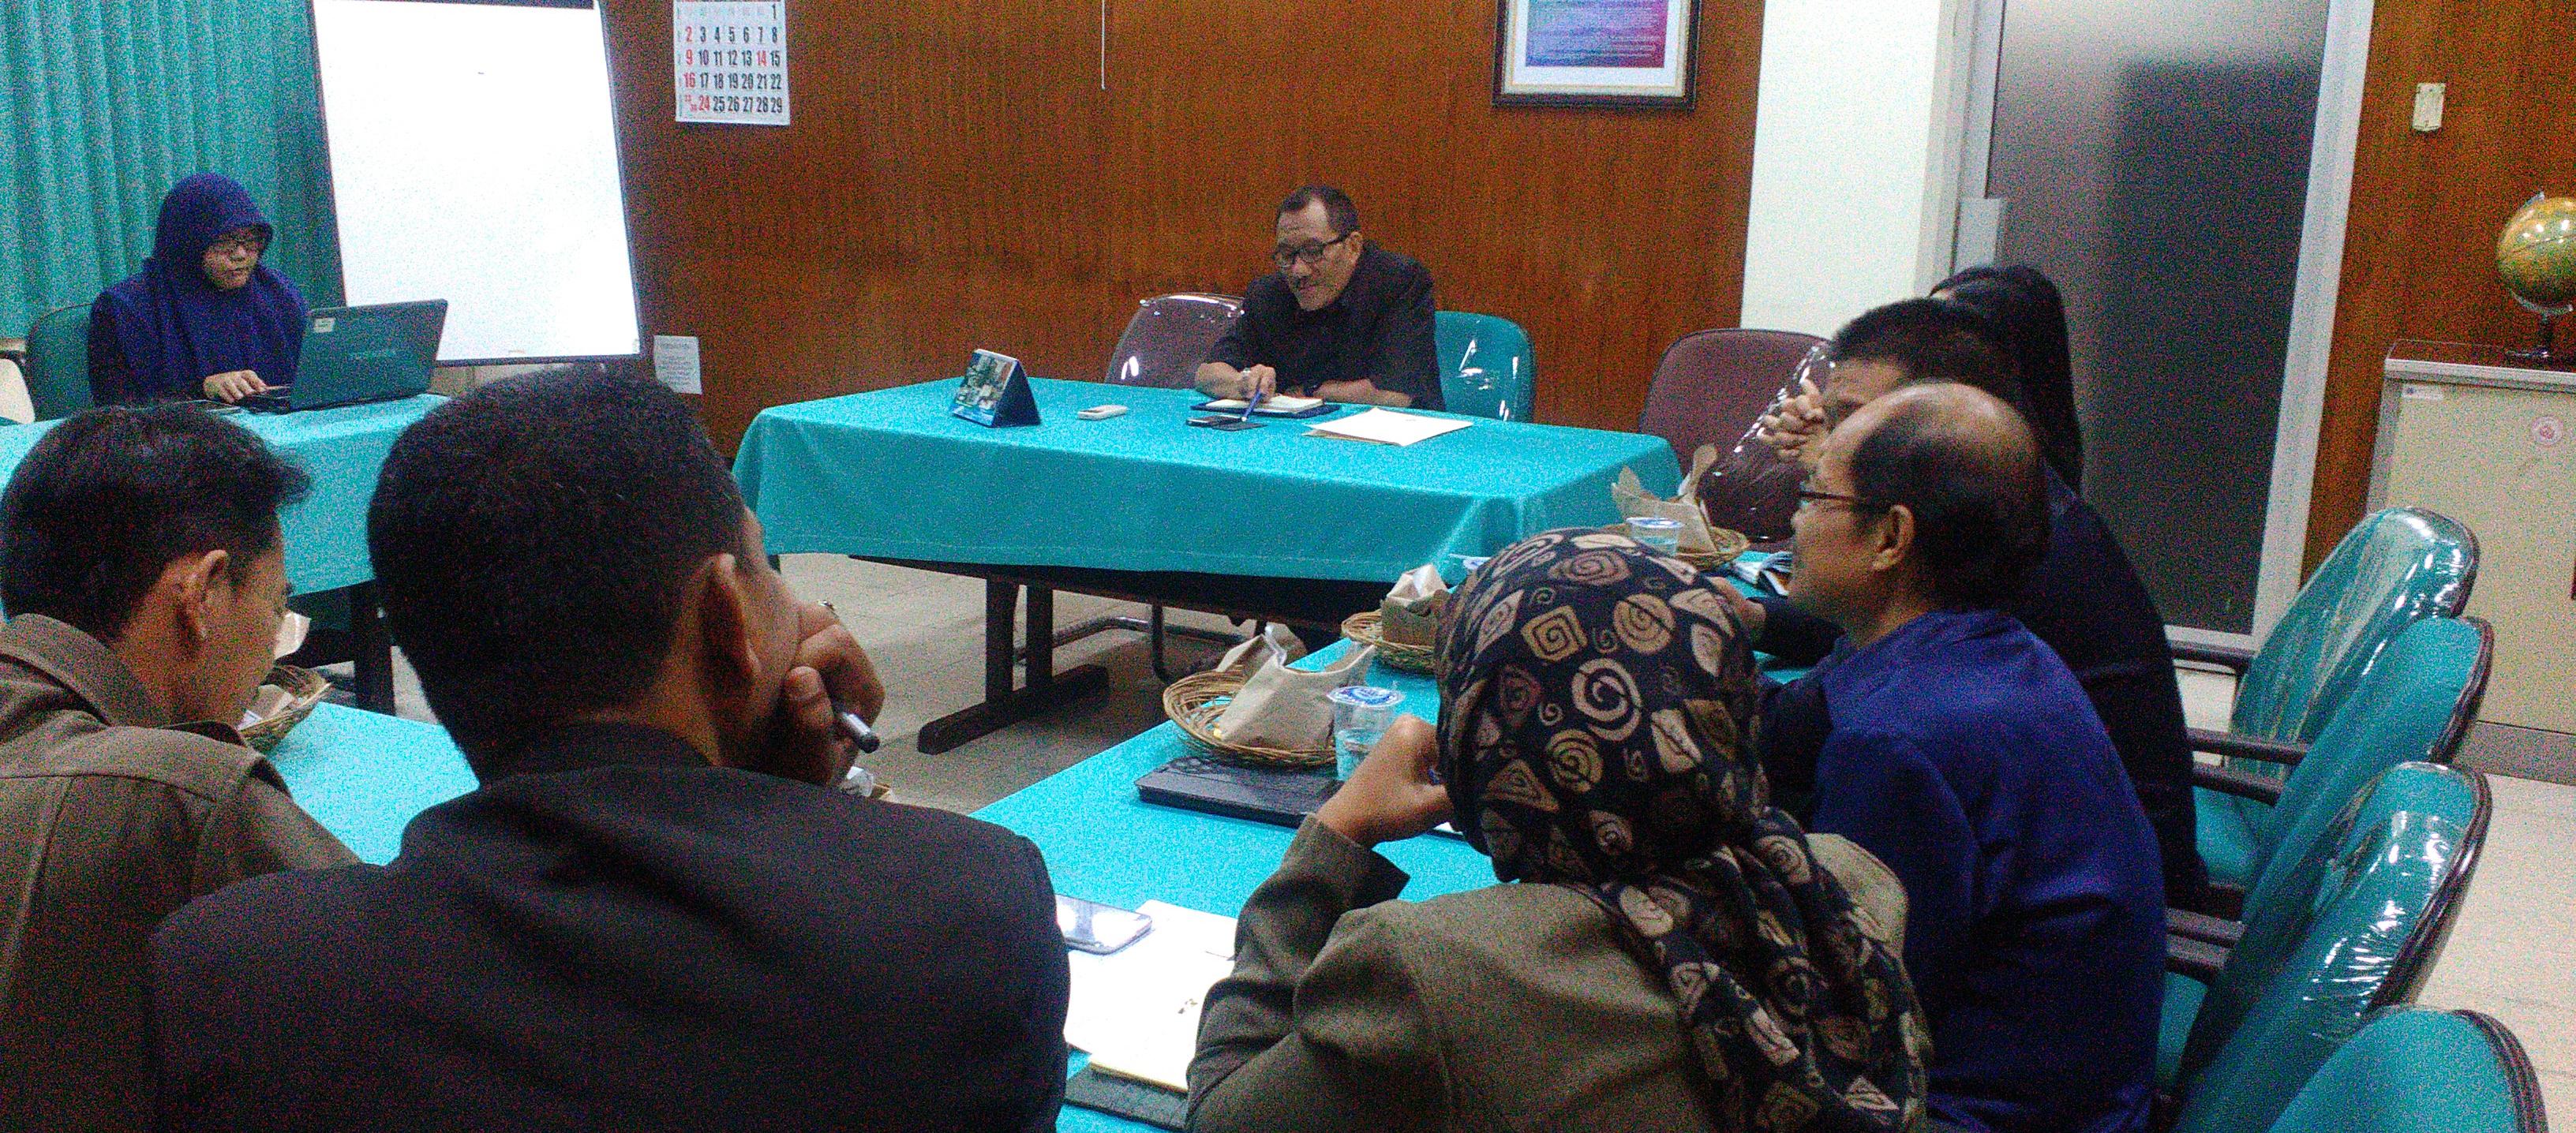 Rapat Koordinasi di Lingkungan Biro AKPIK